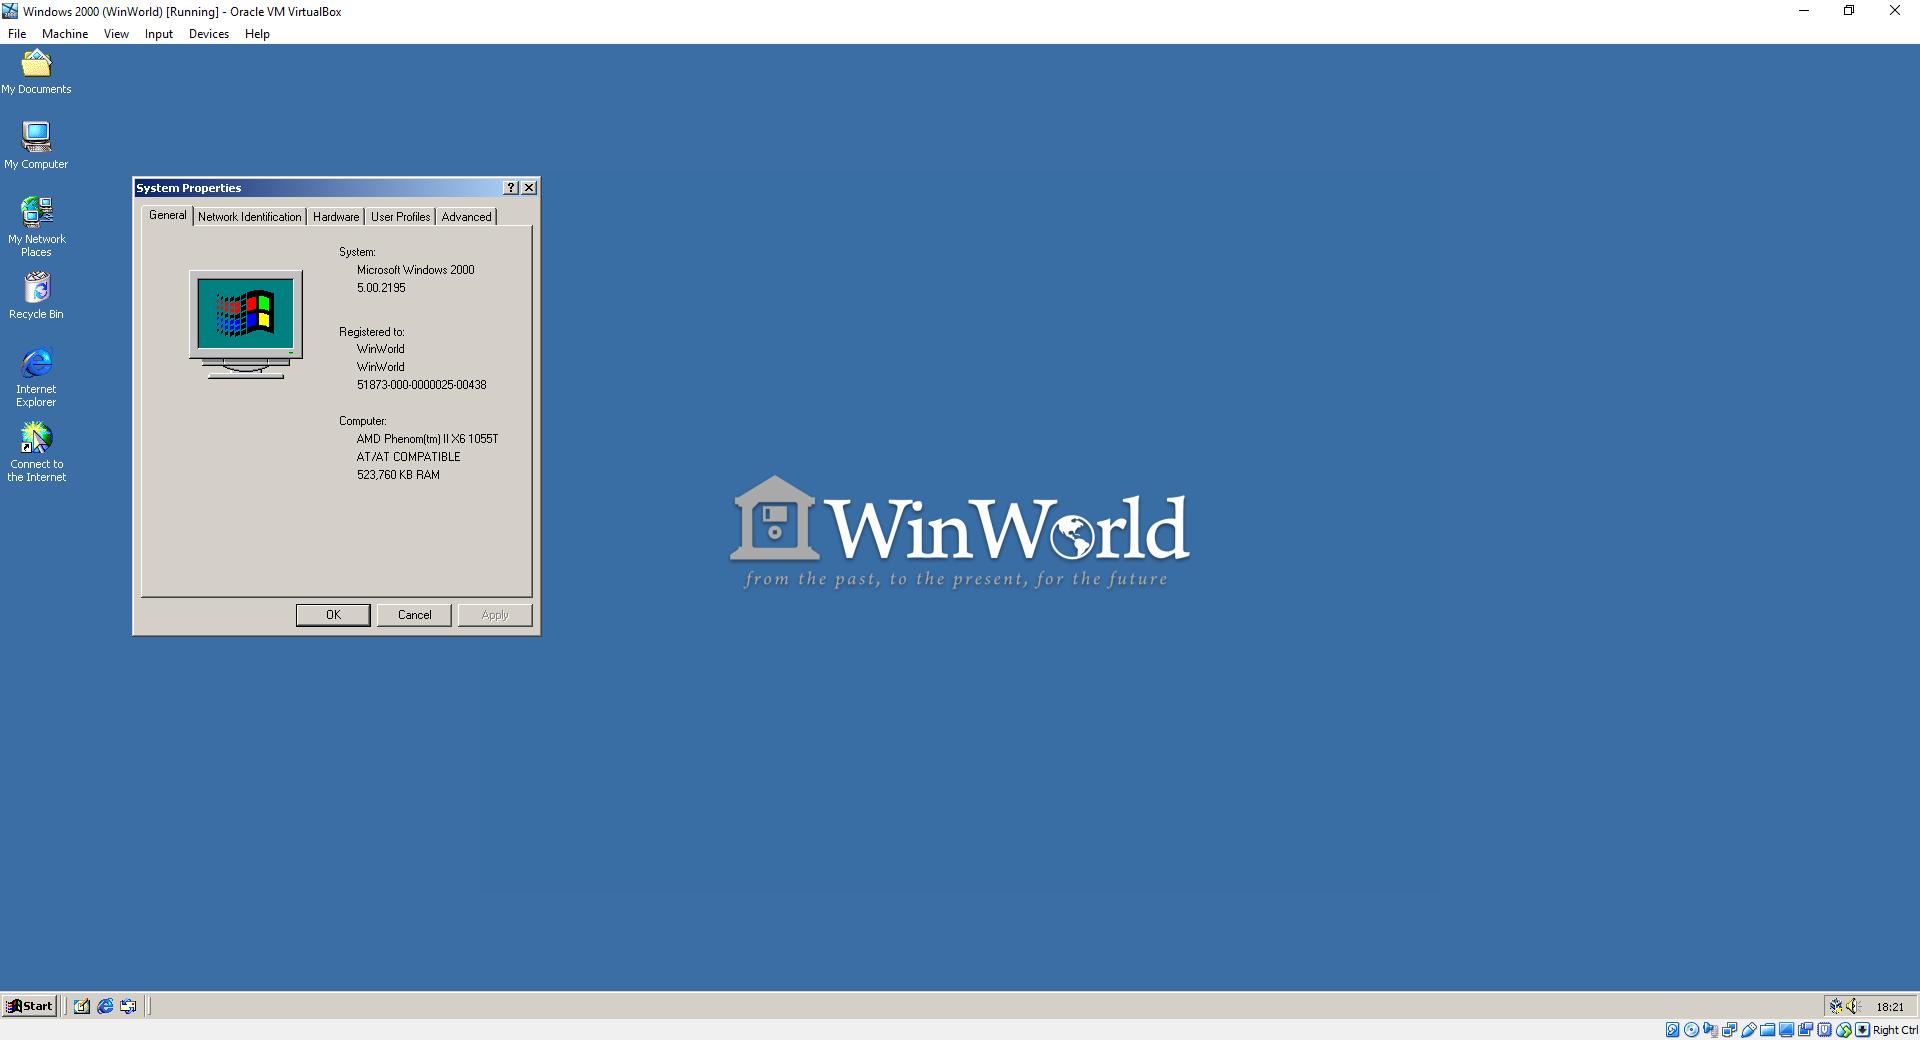 Windows 2000 VM for Virtualbox — WinWorld